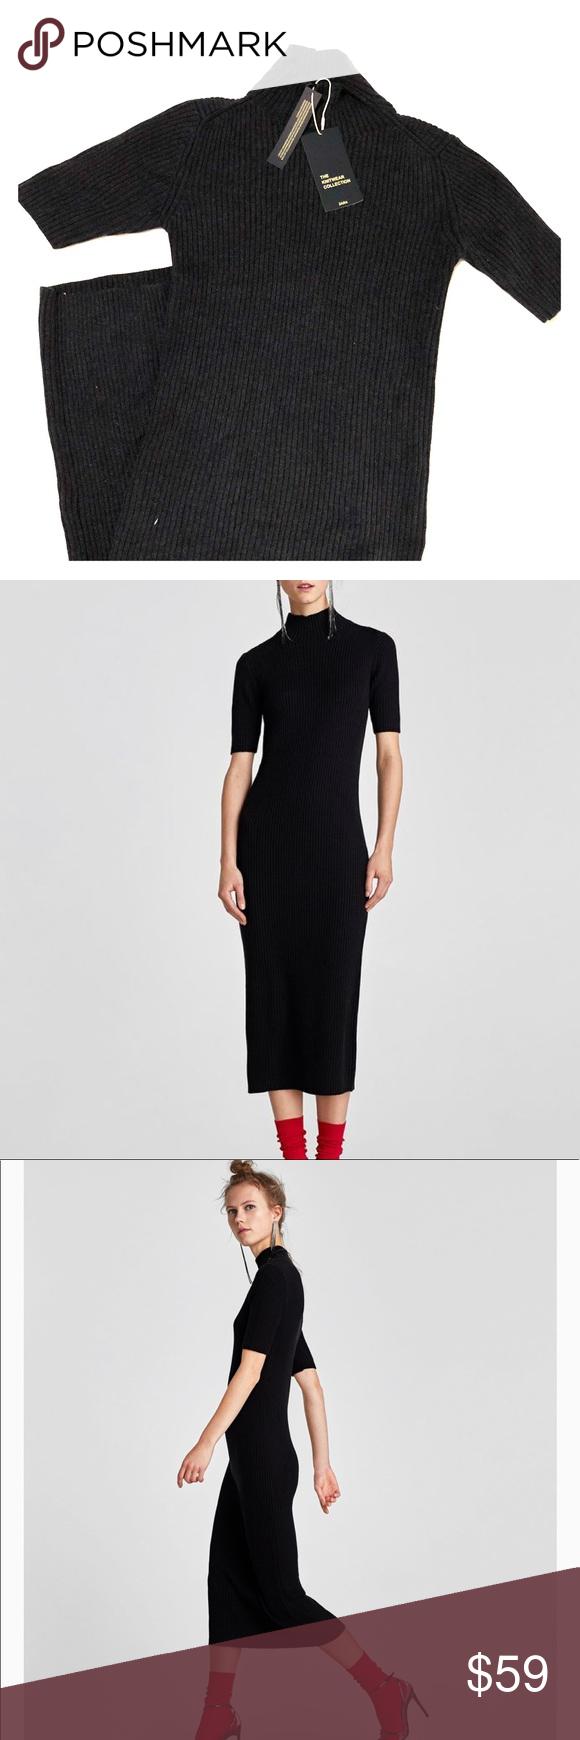 f7a0936004 NWT 🏷Zara Knit Ribbed Midi Dress Never worn, perfect condition Zara ...